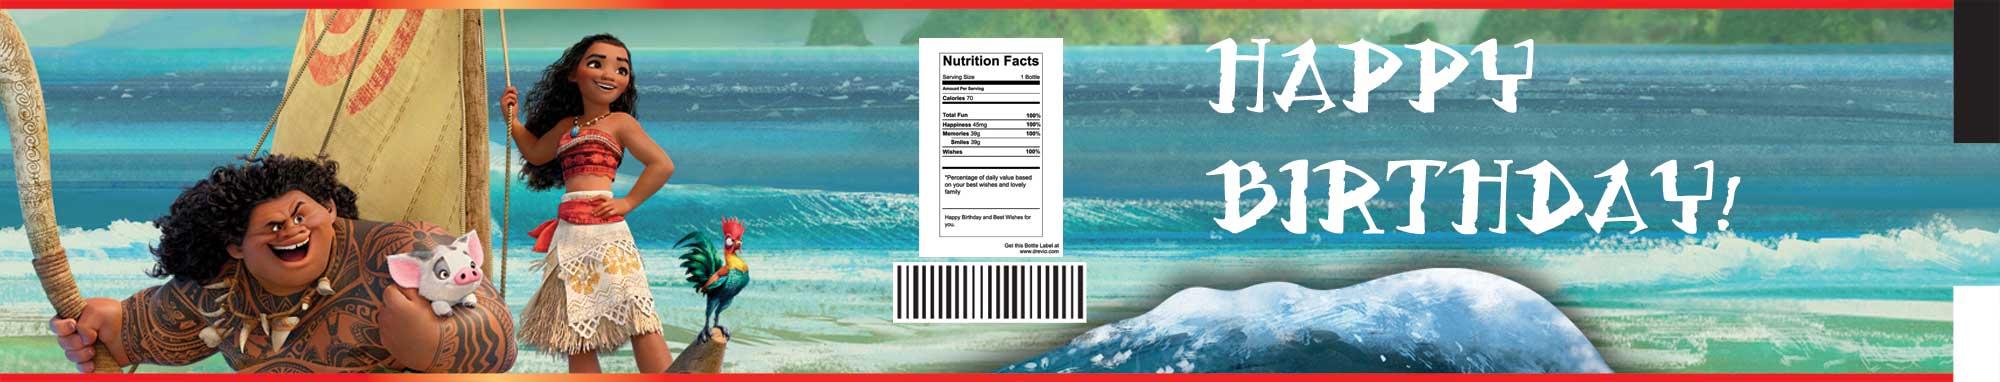 FREE Moana Water Bottle Labels Template FREE Invitation Templates Drevio